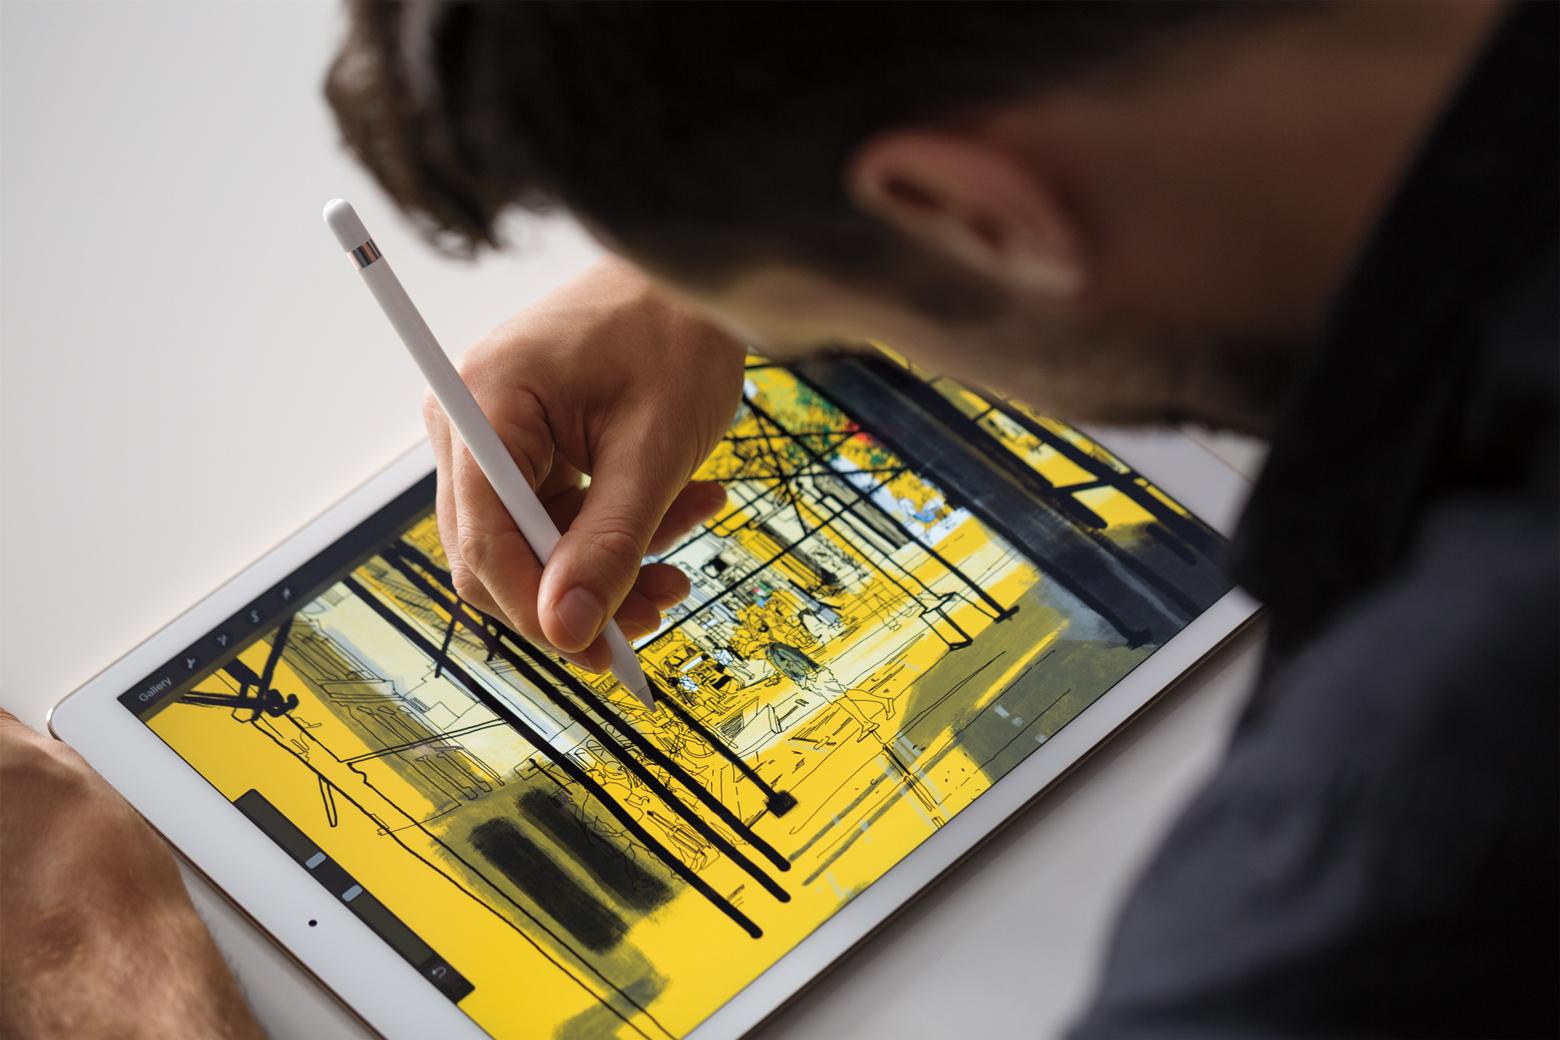 product shot of iPad Pro, Apple Pencil, iPad Pro, image editing tablet